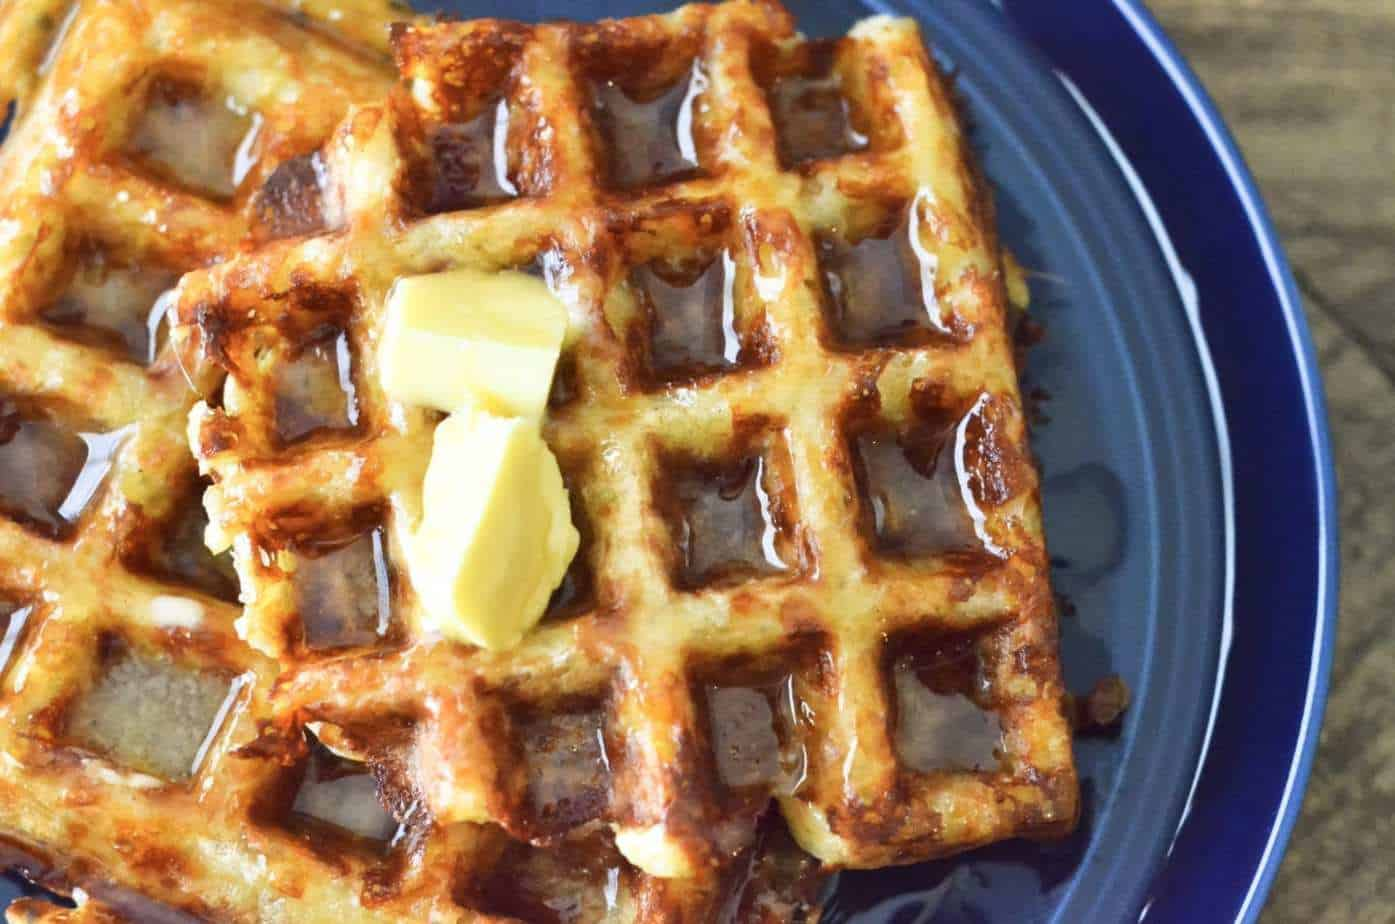 Keto waffles or chaffles